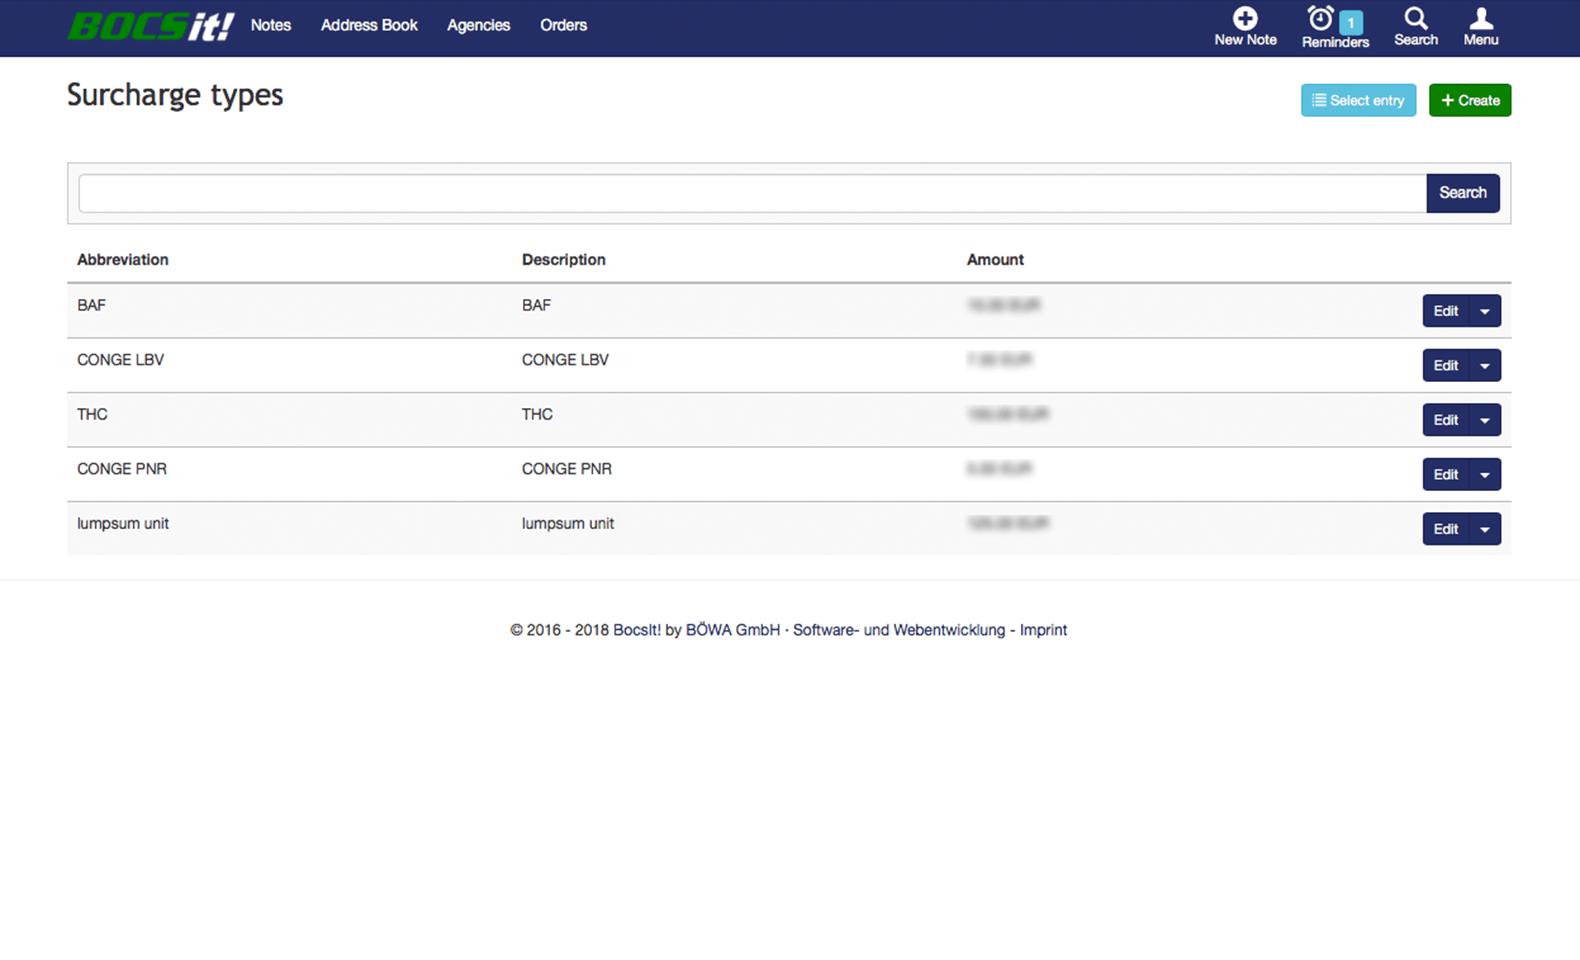 BOCS - CRM - Basisdatenverwaltung